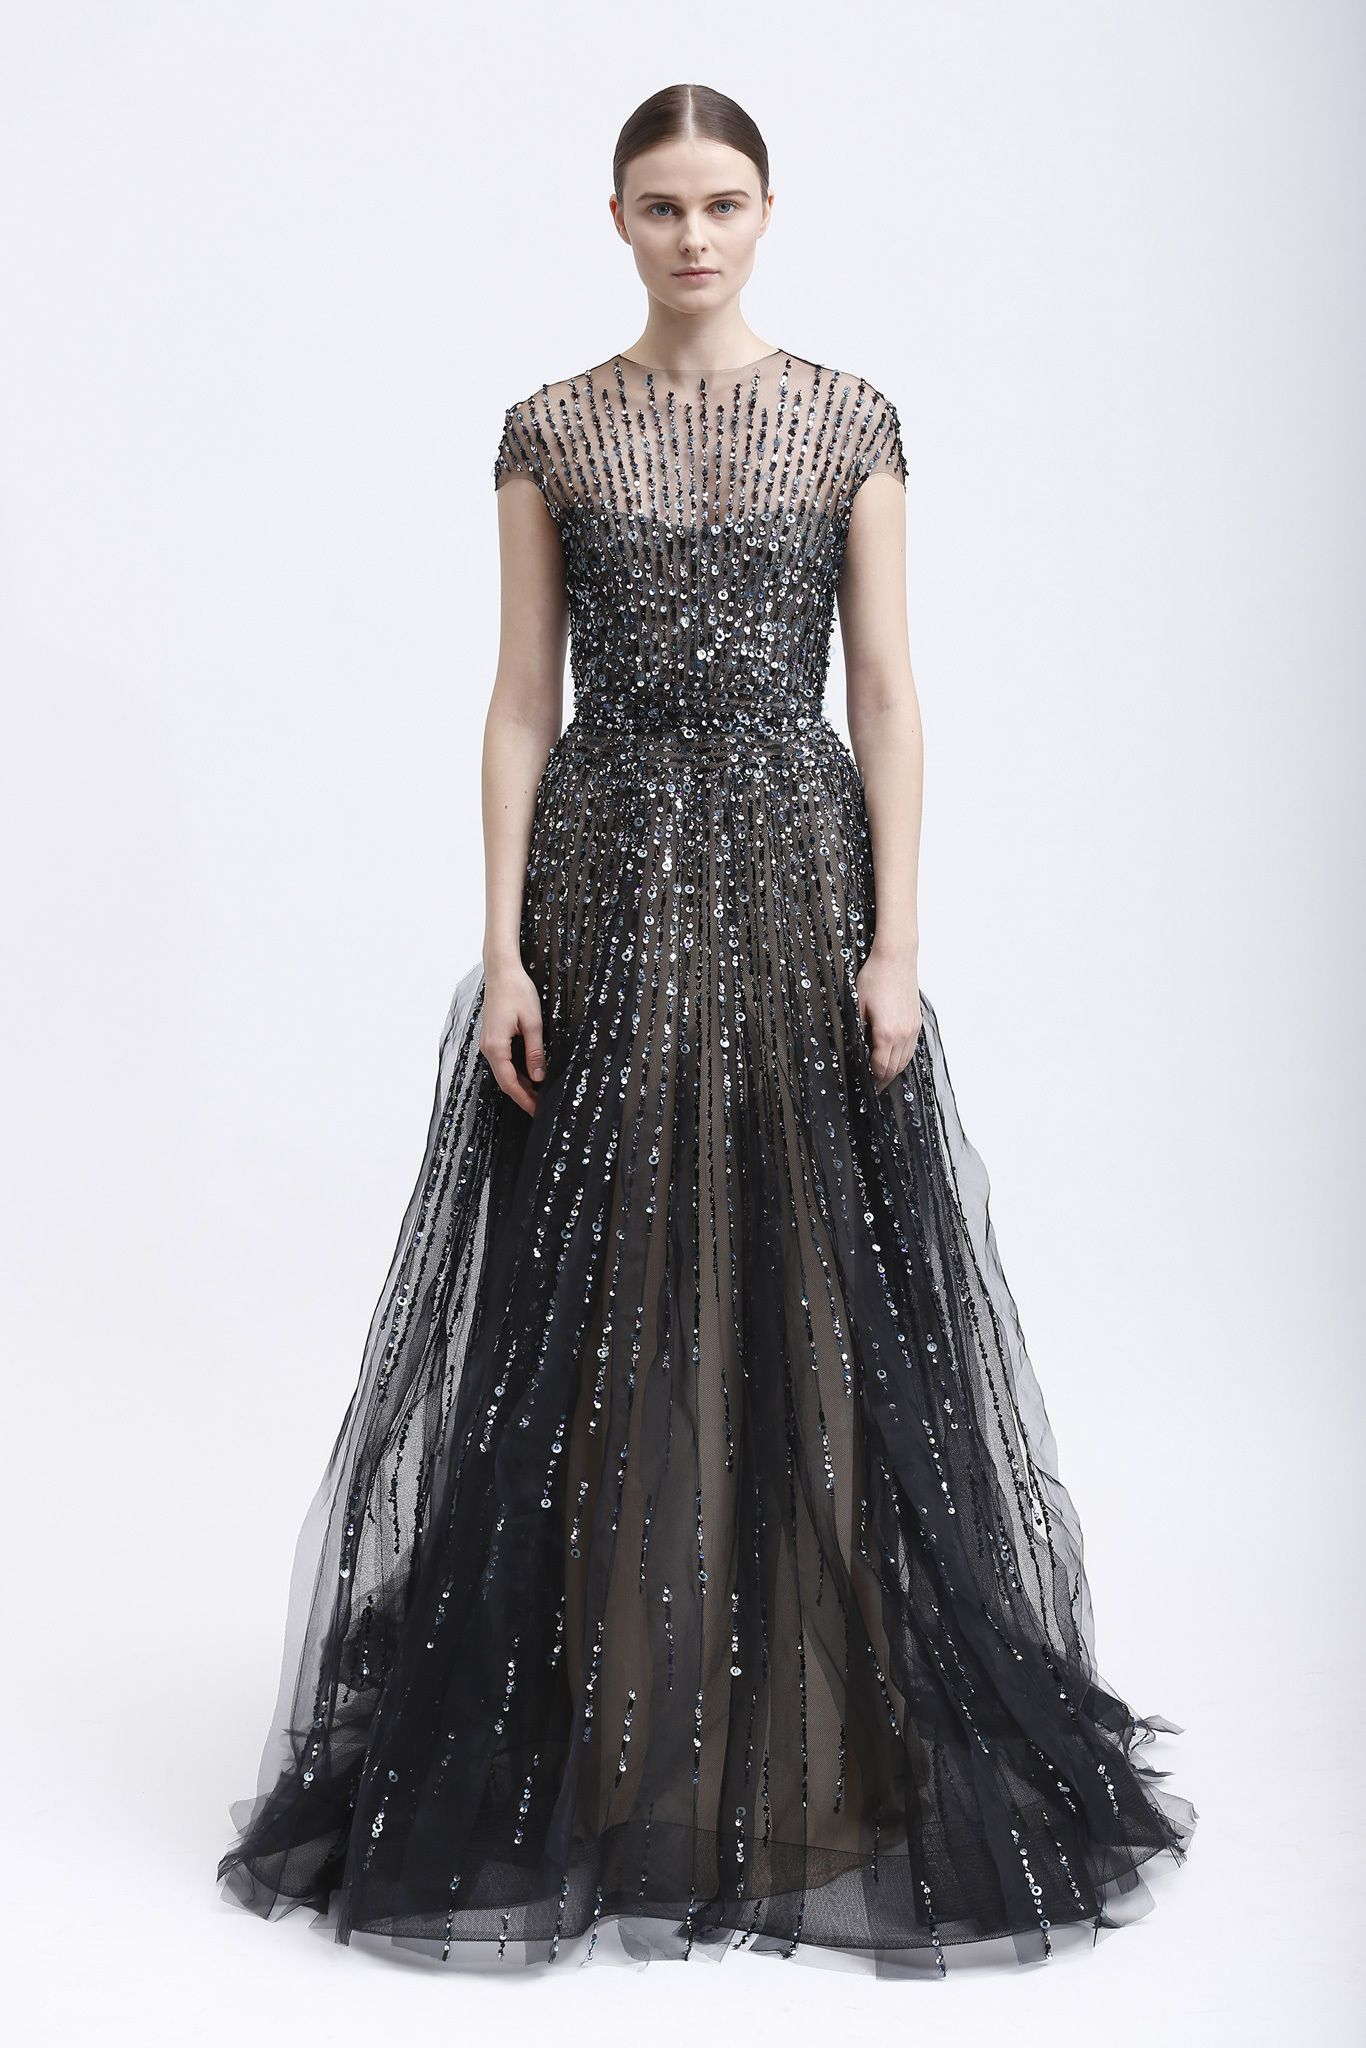 Monique lhuillier prefall dresses in black pinterest